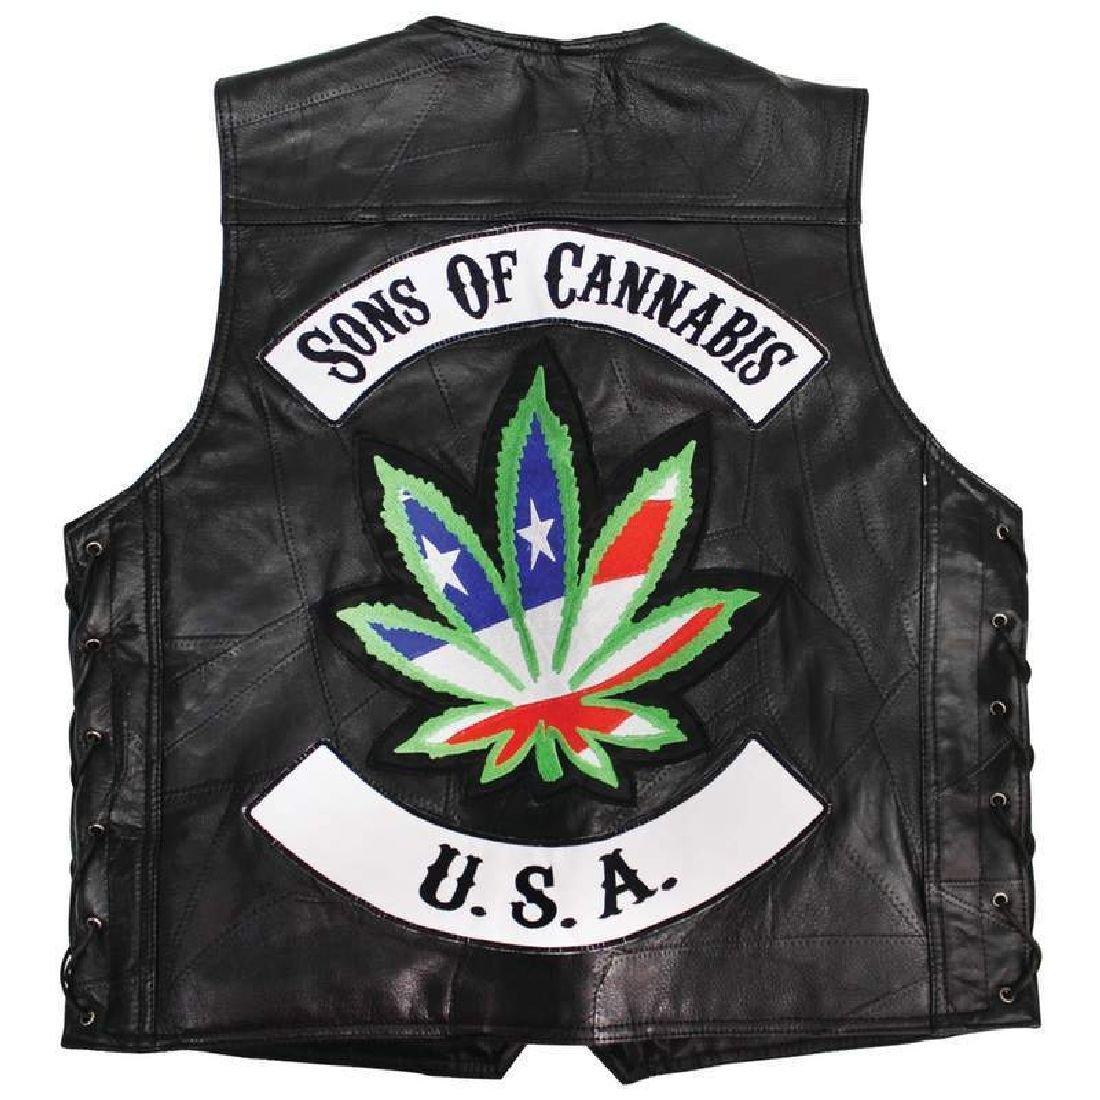 【50%OFF】 メンズブラック本革オートバイベストバイカーポットUSA Flag Flag (Men's) Size Marijuana Size (Men's) 3XL B0753DKYCL, パターアイランド:6ef1f579 --- a0267596.xsph.ru